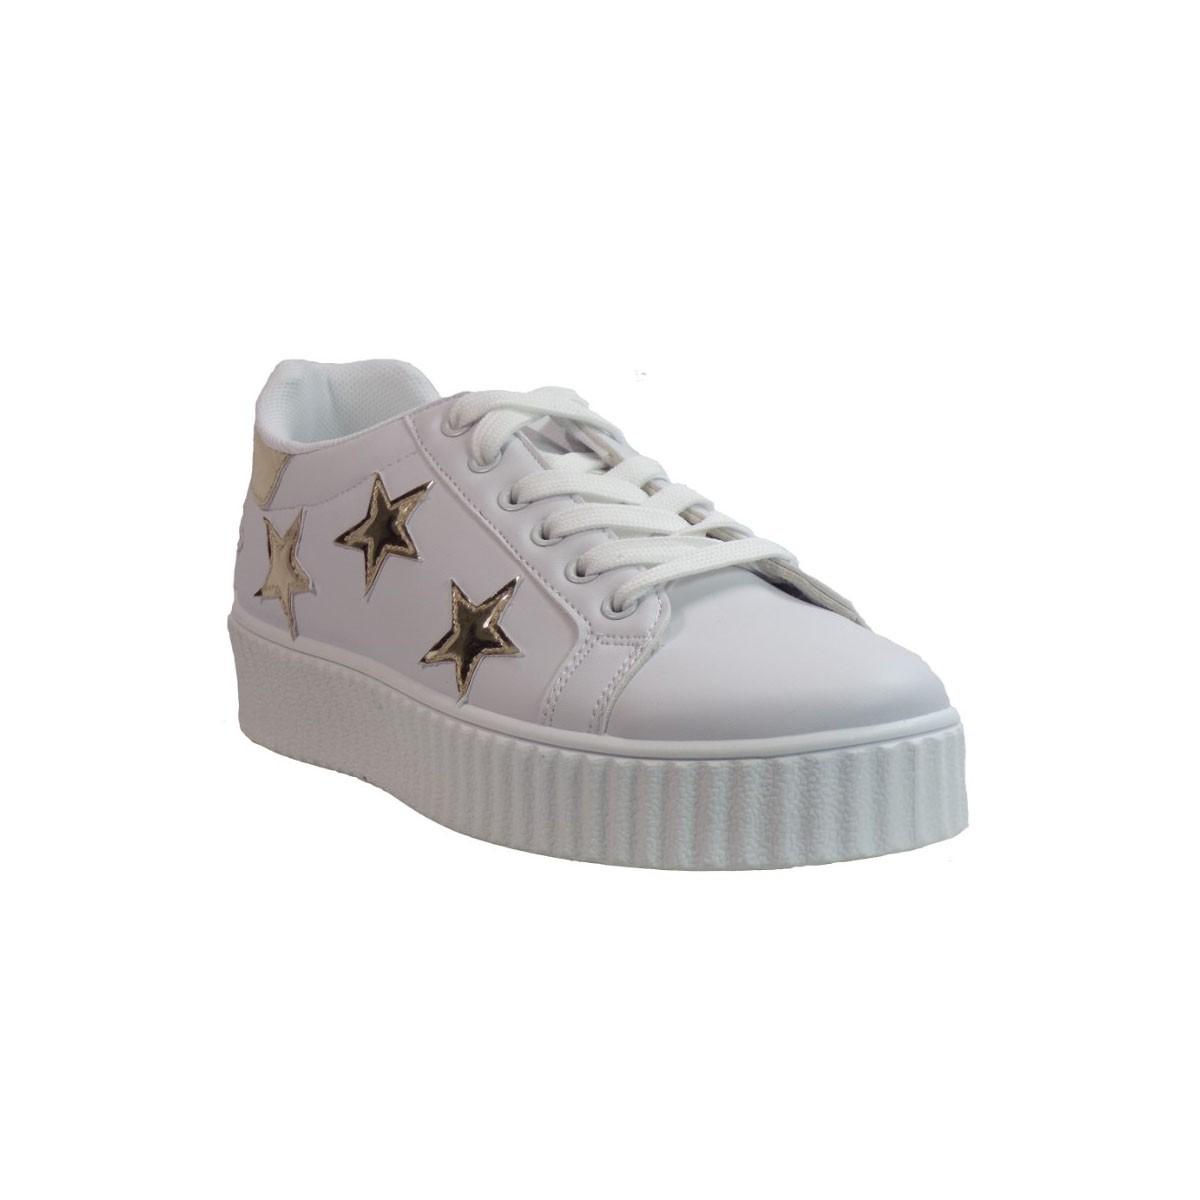 Bagiota shoes Sneakers Παπούτσια Γυναικεία QQ135 Άσπρο Χρυσό Bagiota shoes QQ135 Άσπρο Χρυσό